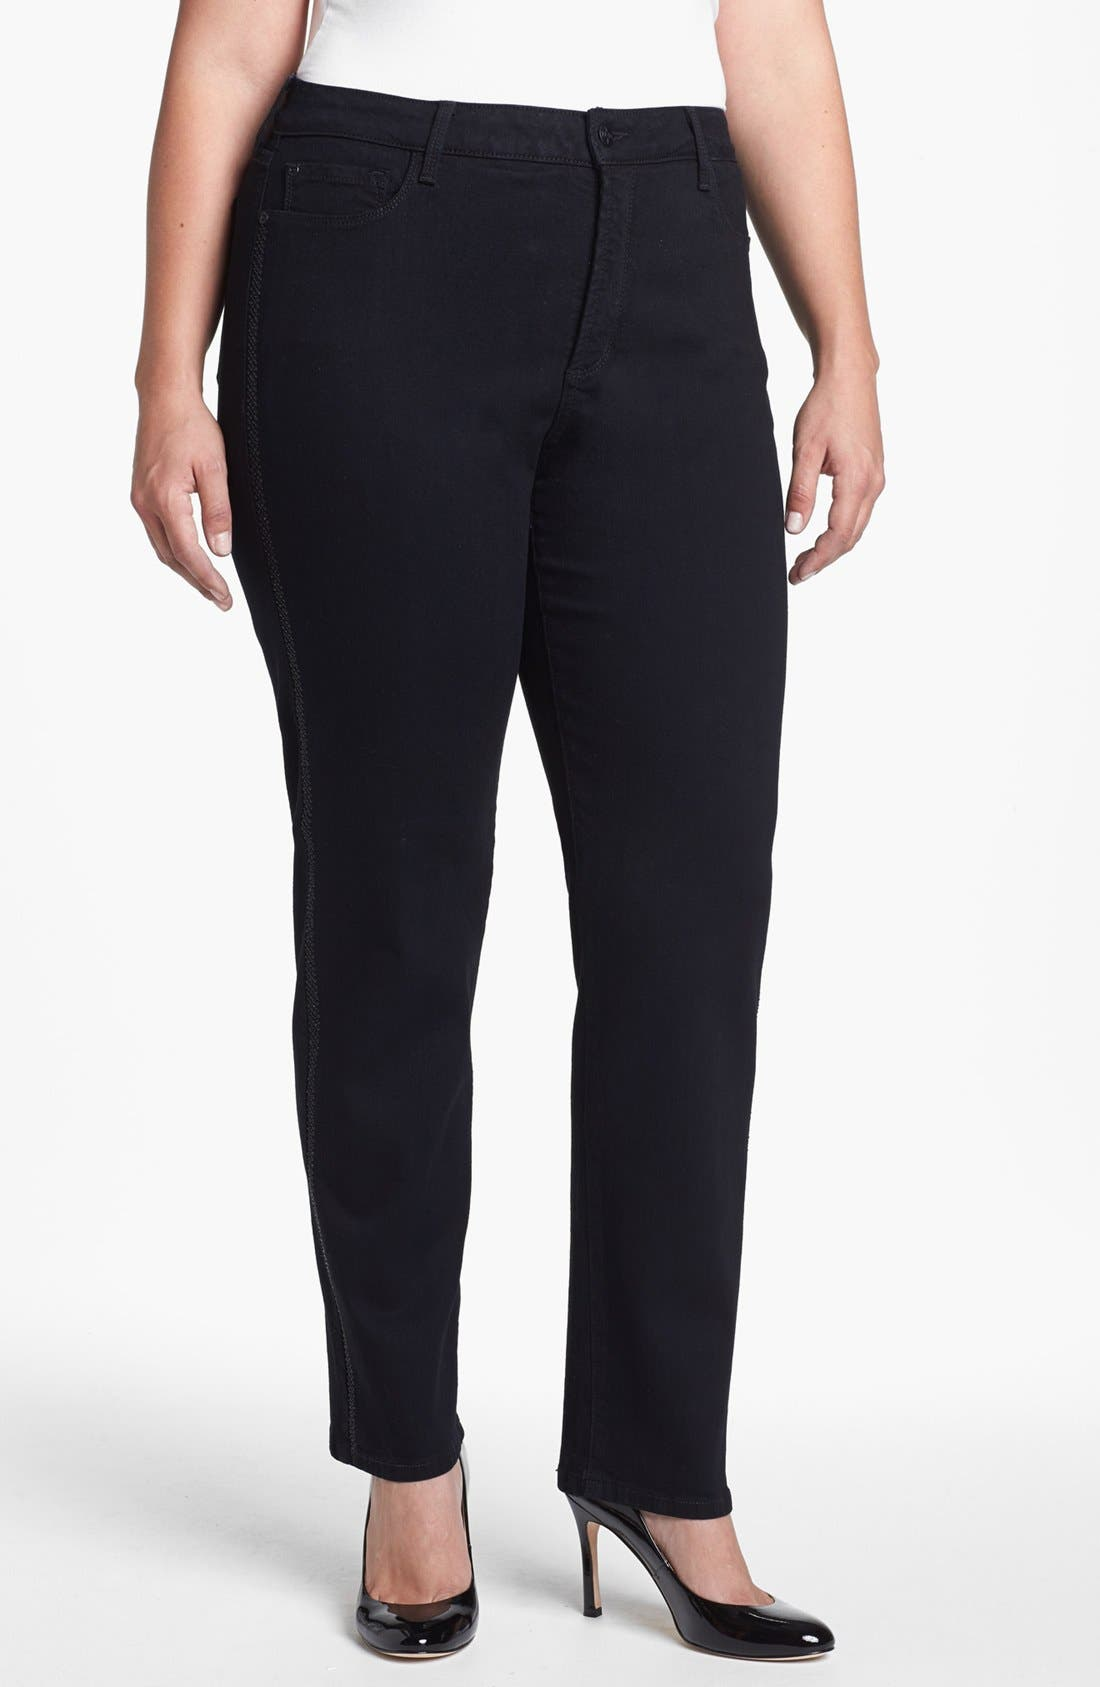 Alternate Image 1 Selected - NYDJ 'Sheri' Embellished Trim Stretch Skinny Jeans (Plus Size)